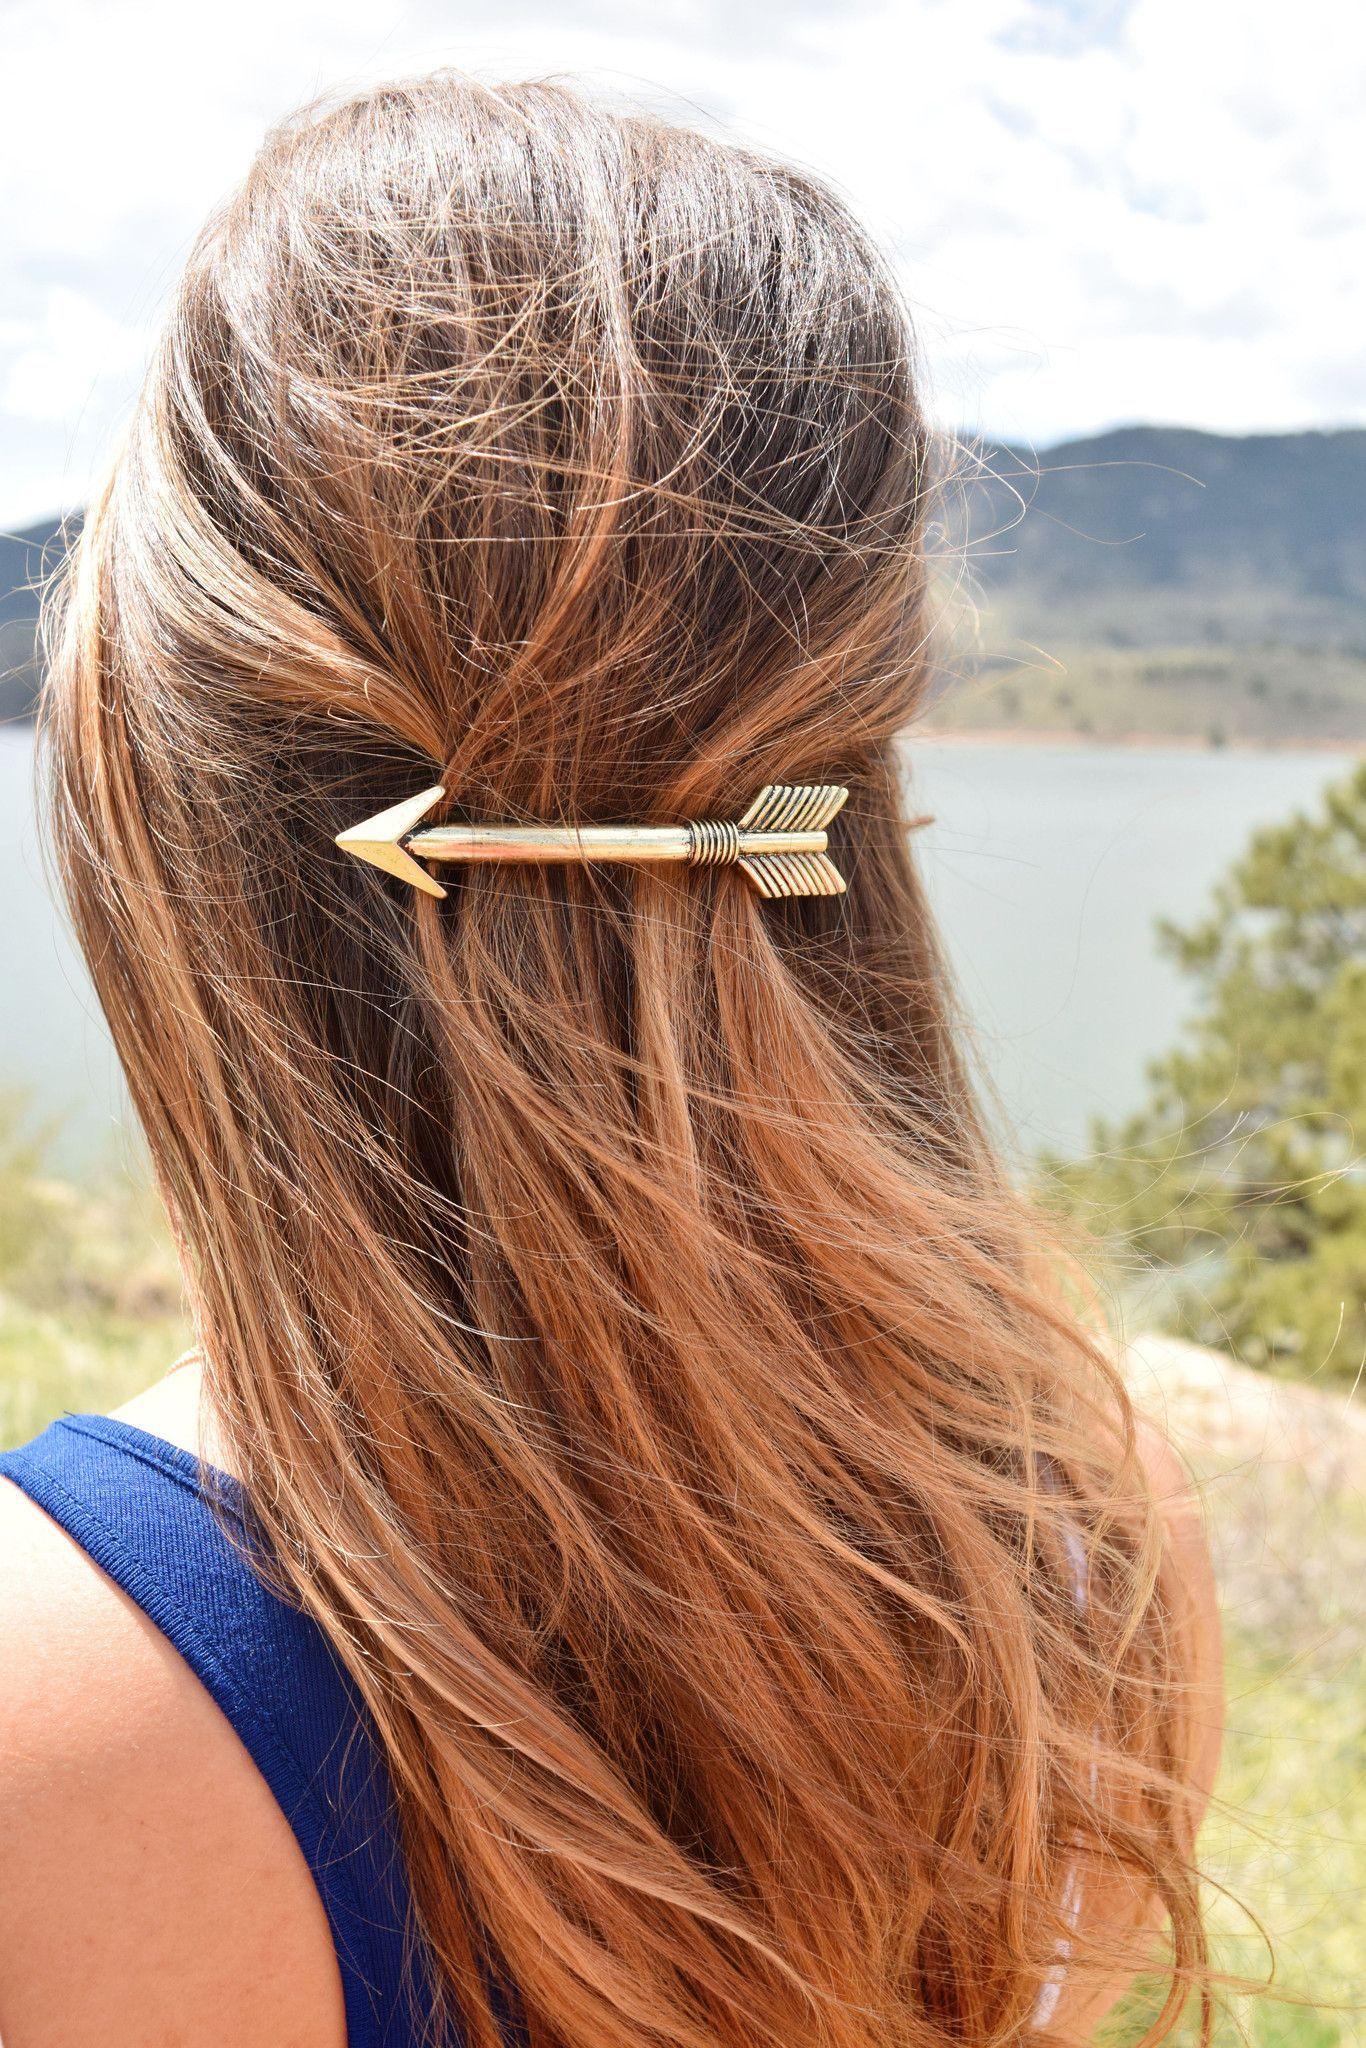 Nice Fashion Sweat Accesorios Para El Cabello Barrette Hair Ties Fur Headband Headbands For Girls Barrettes Hair Accessories Girls' Clothing